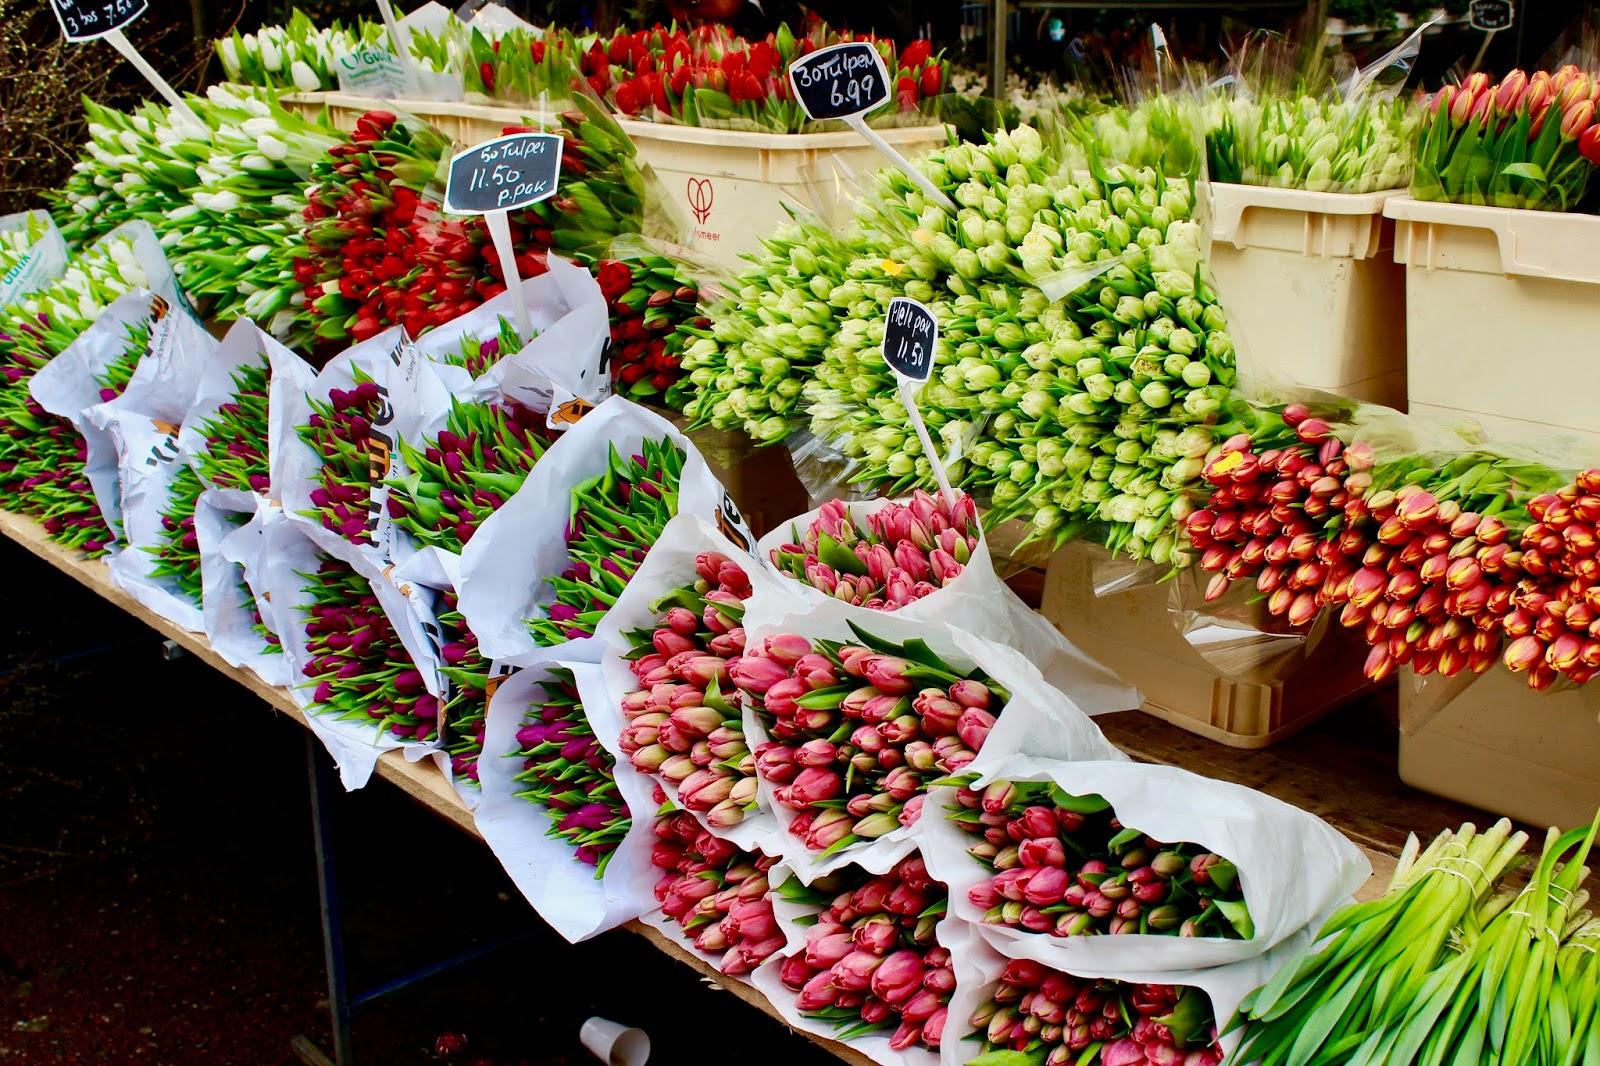 Bloemenmarkt Amsterdam Tulips